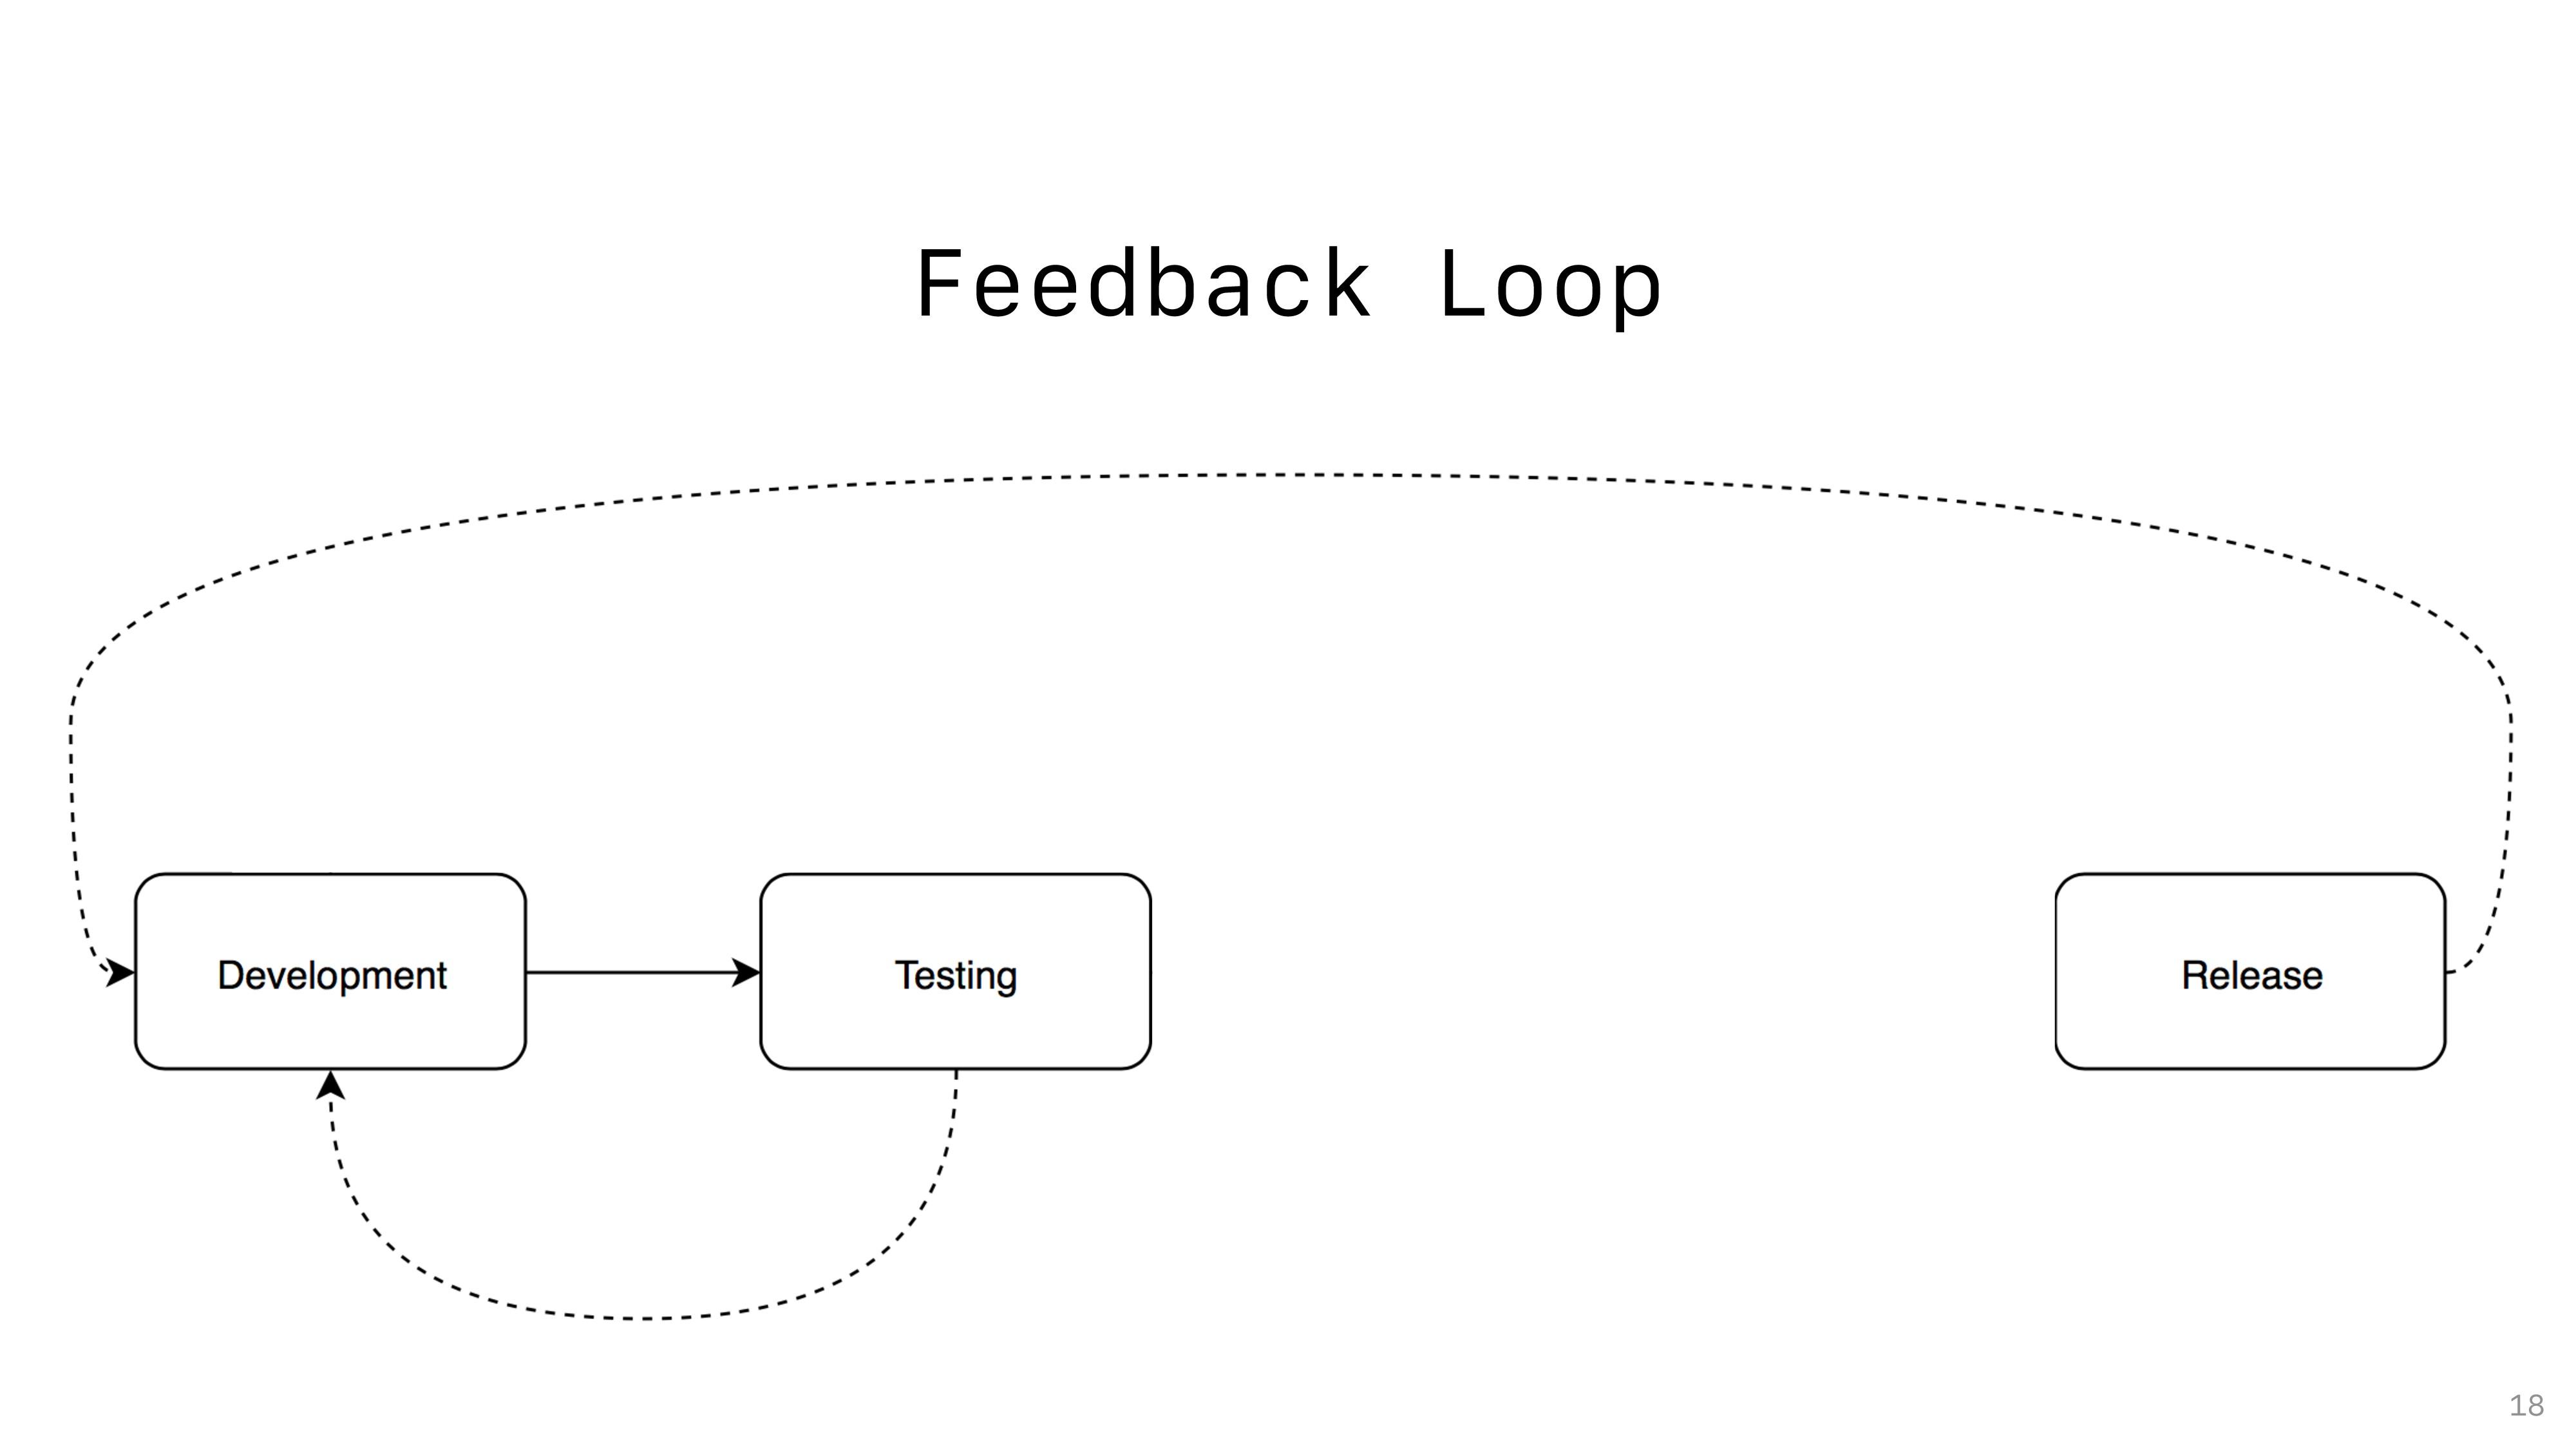 Feedback Loop 18